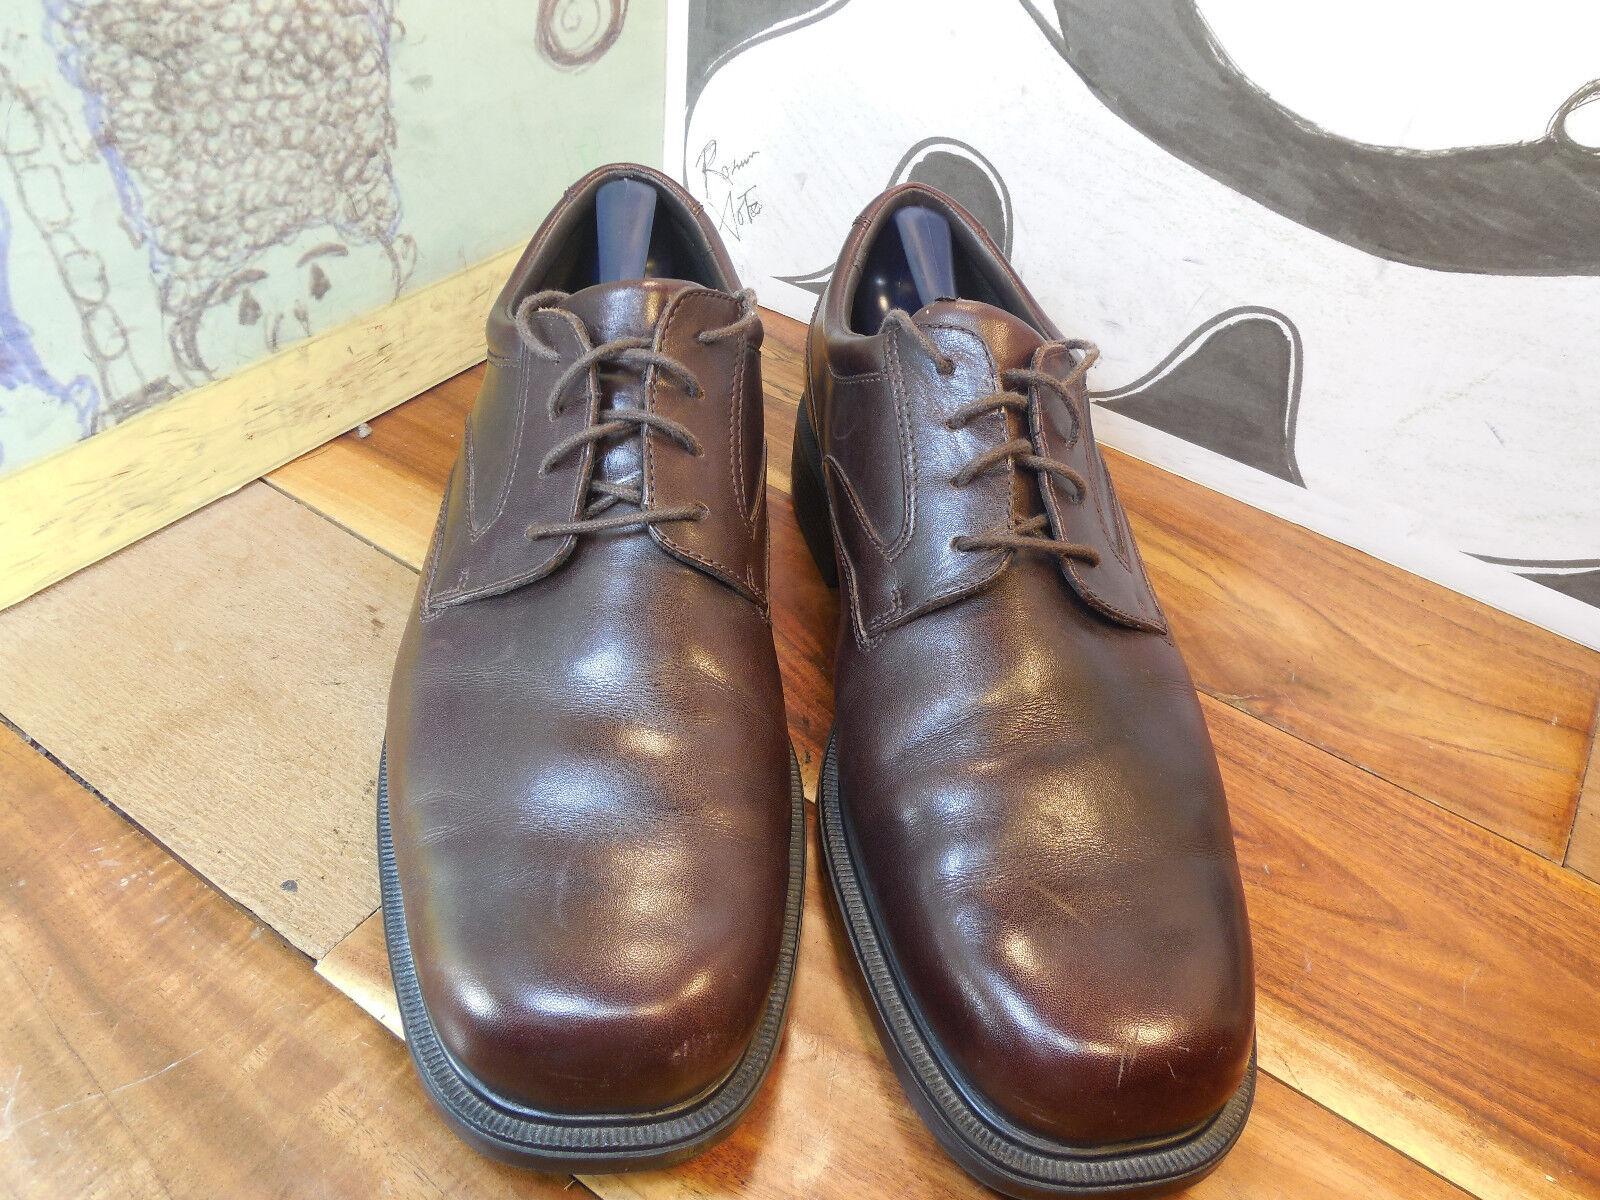 Rockport Brown Leather Oxfords Men's 79182 11.5M #APM 79182 Men's e2e880